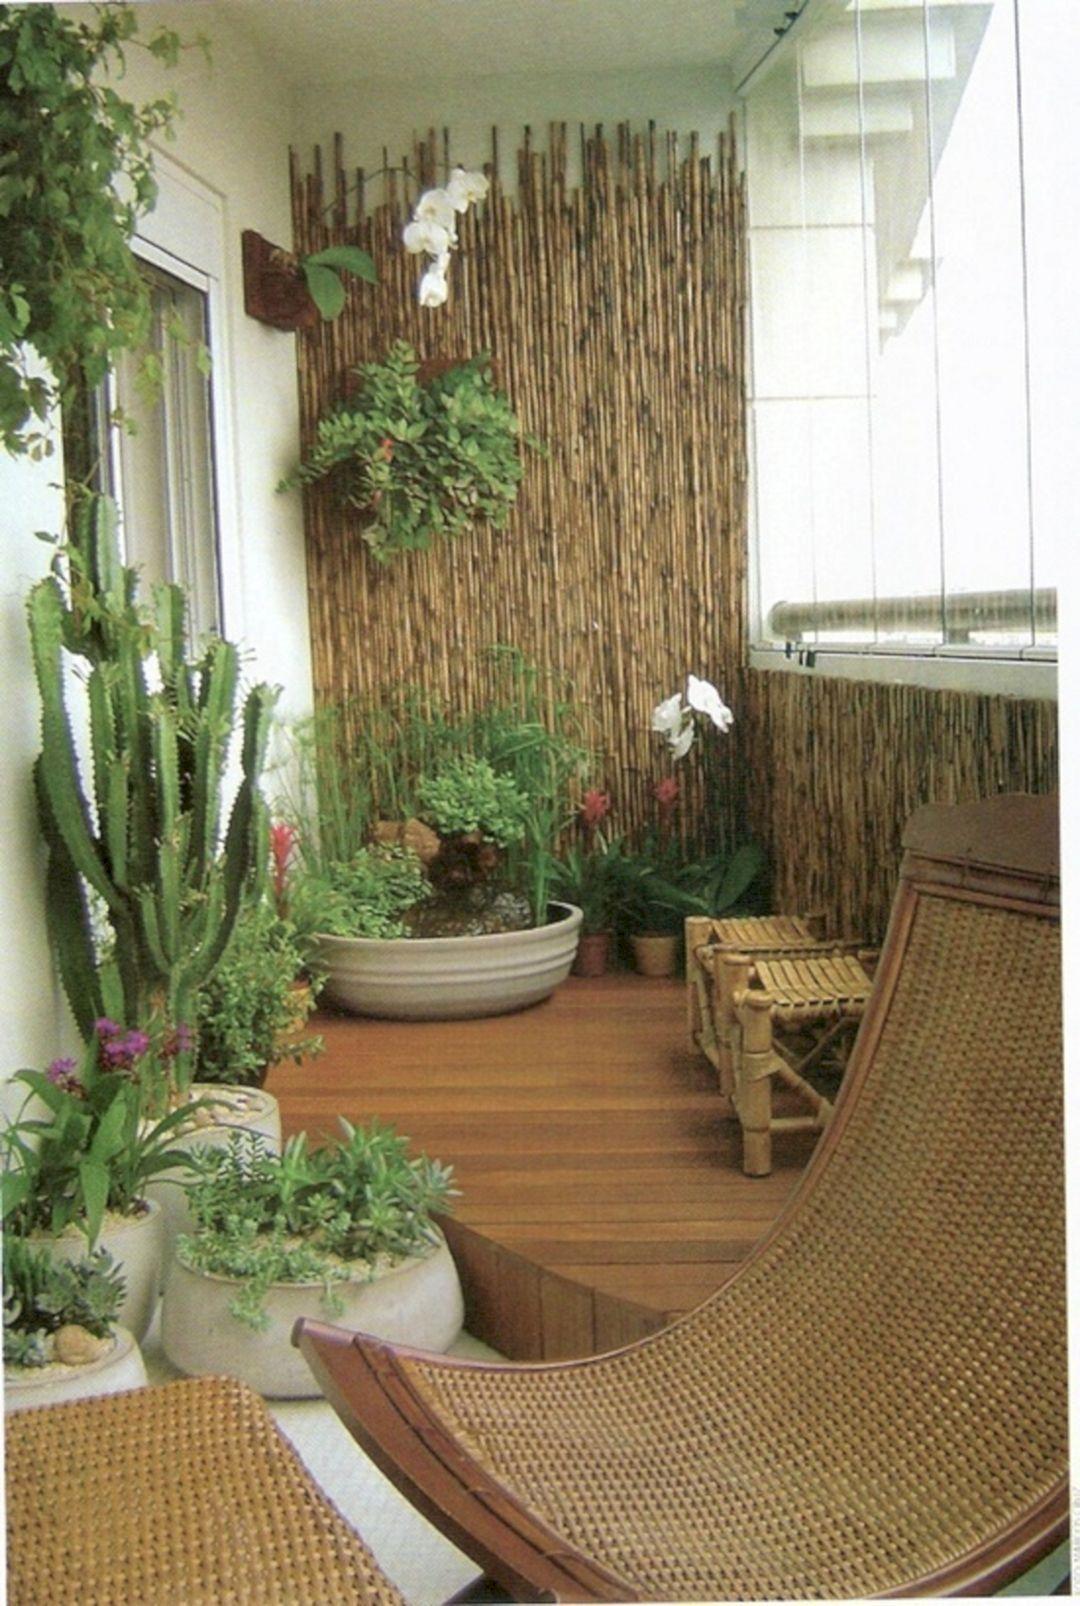 All About Garden Bench Balkon Sichtschutz Bambus Bambus Balkon